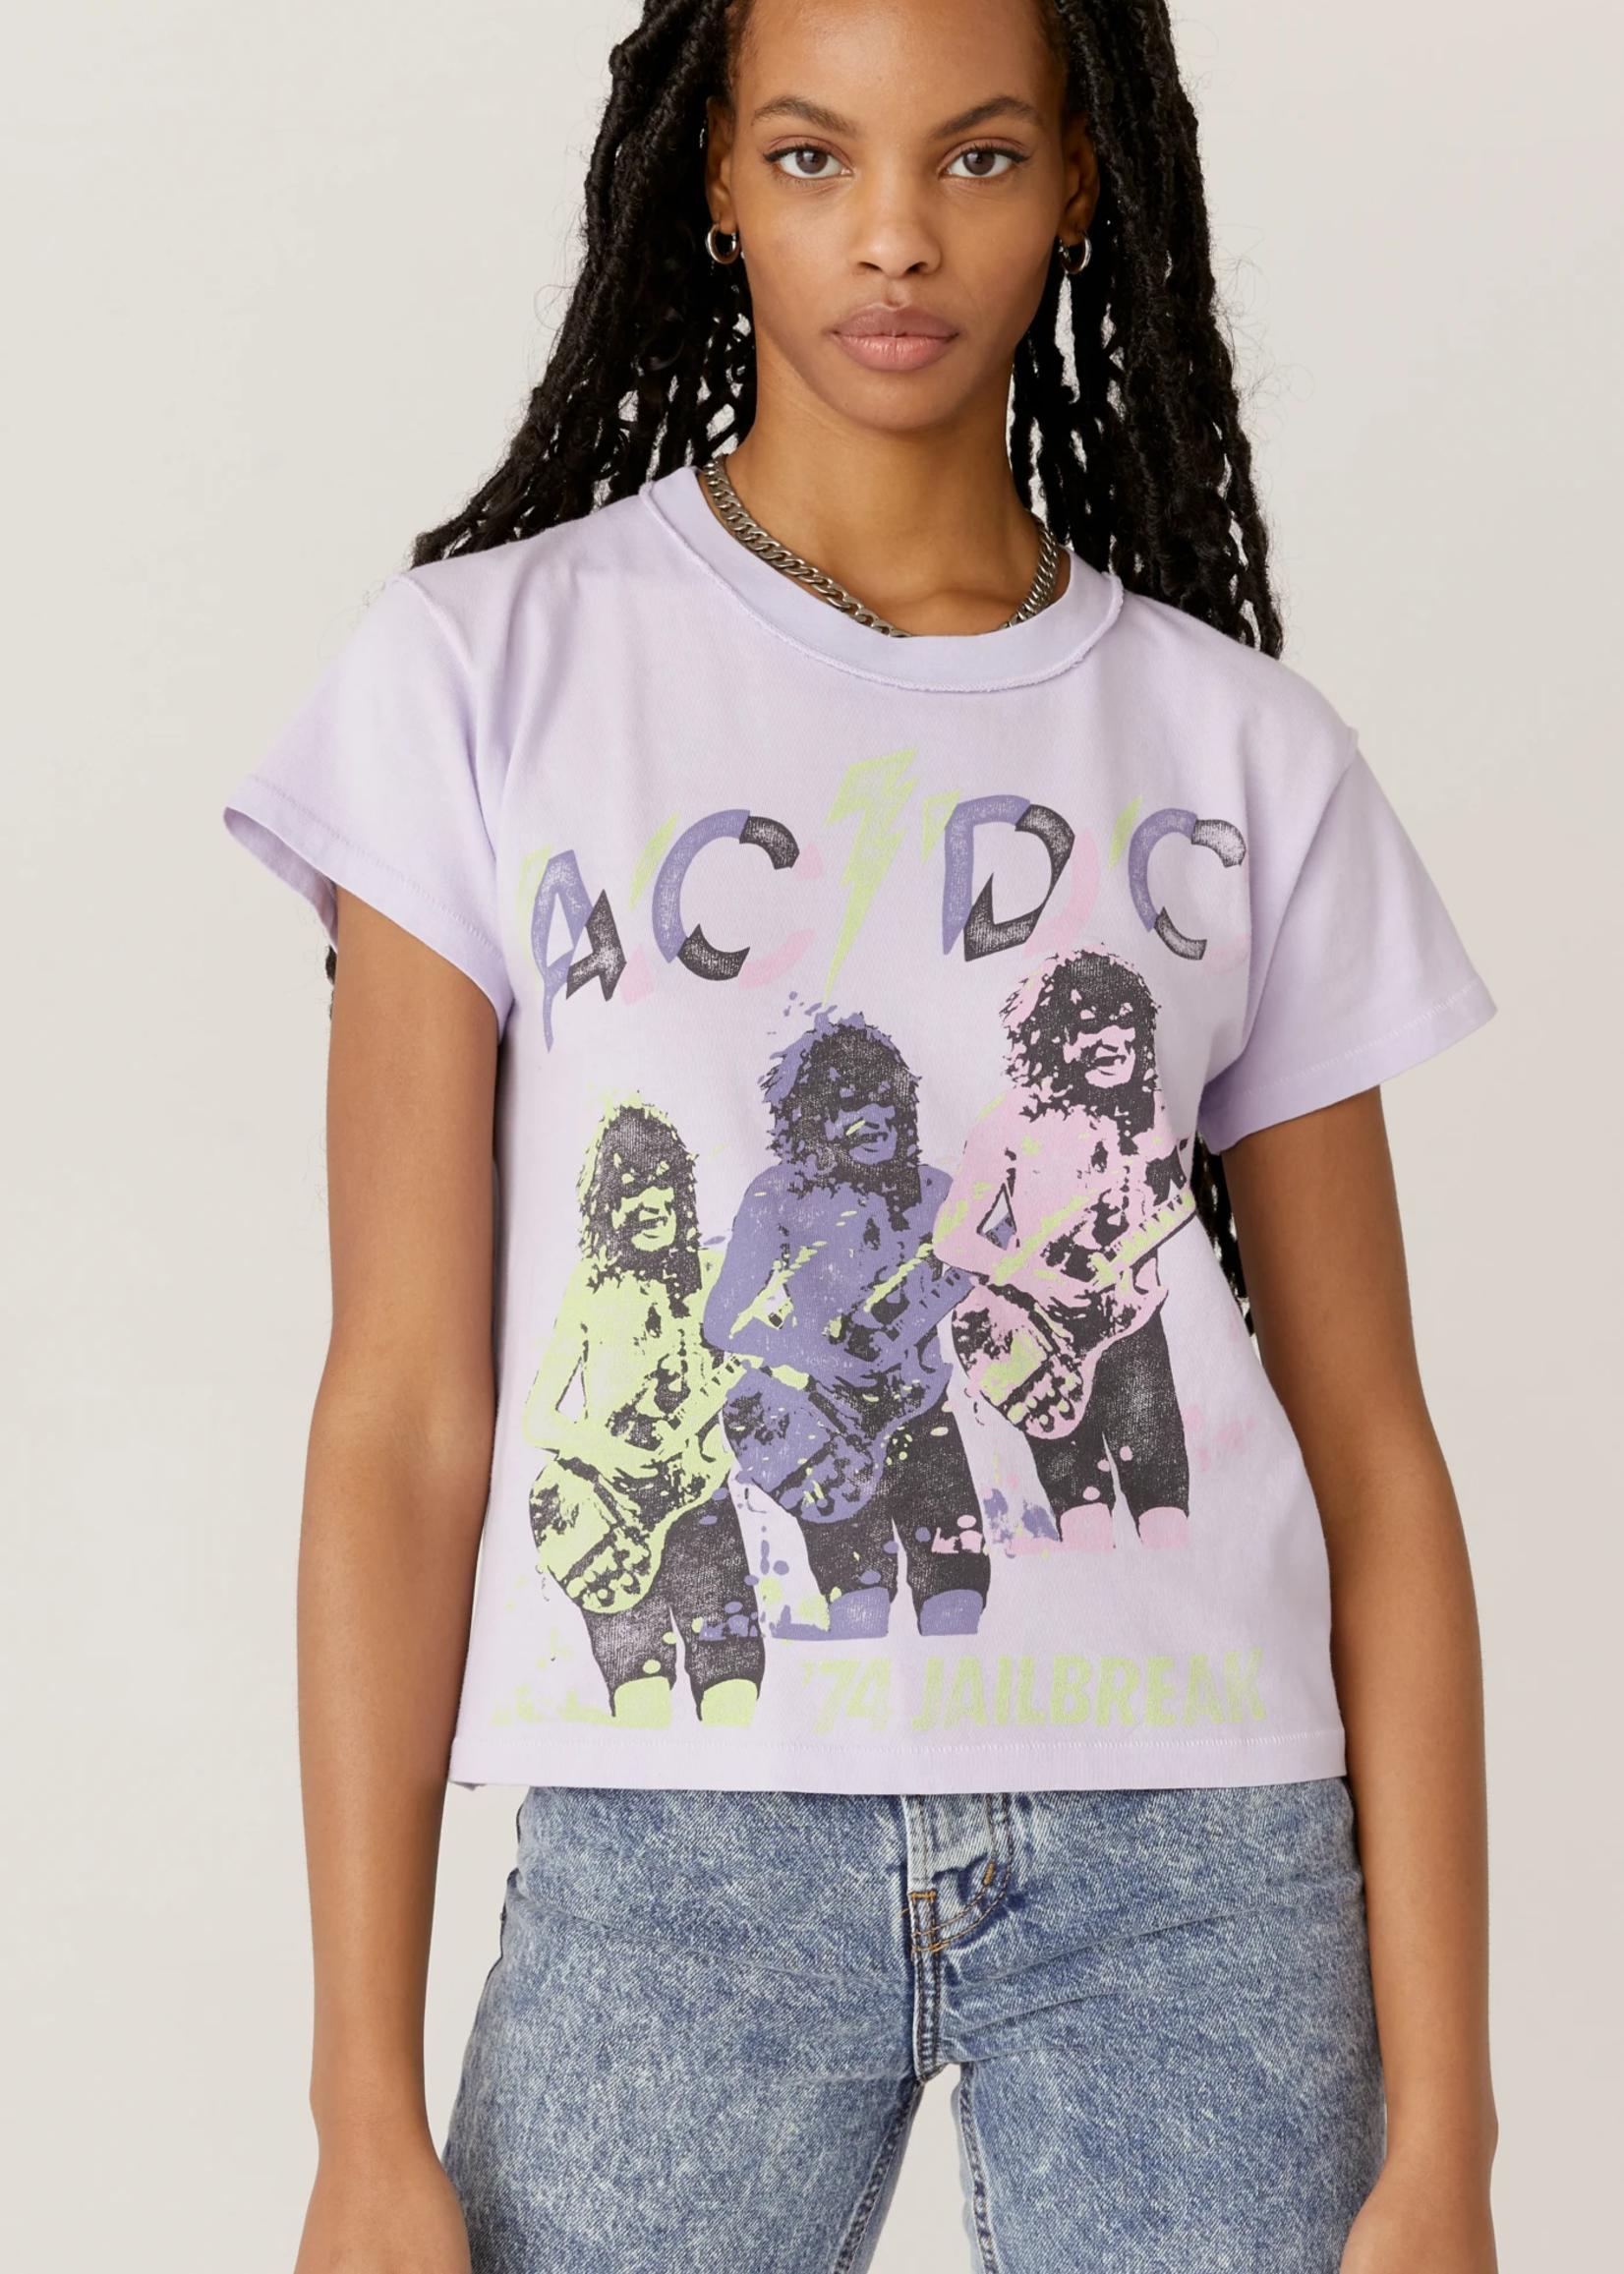 AC/DC Jailbreak Tee